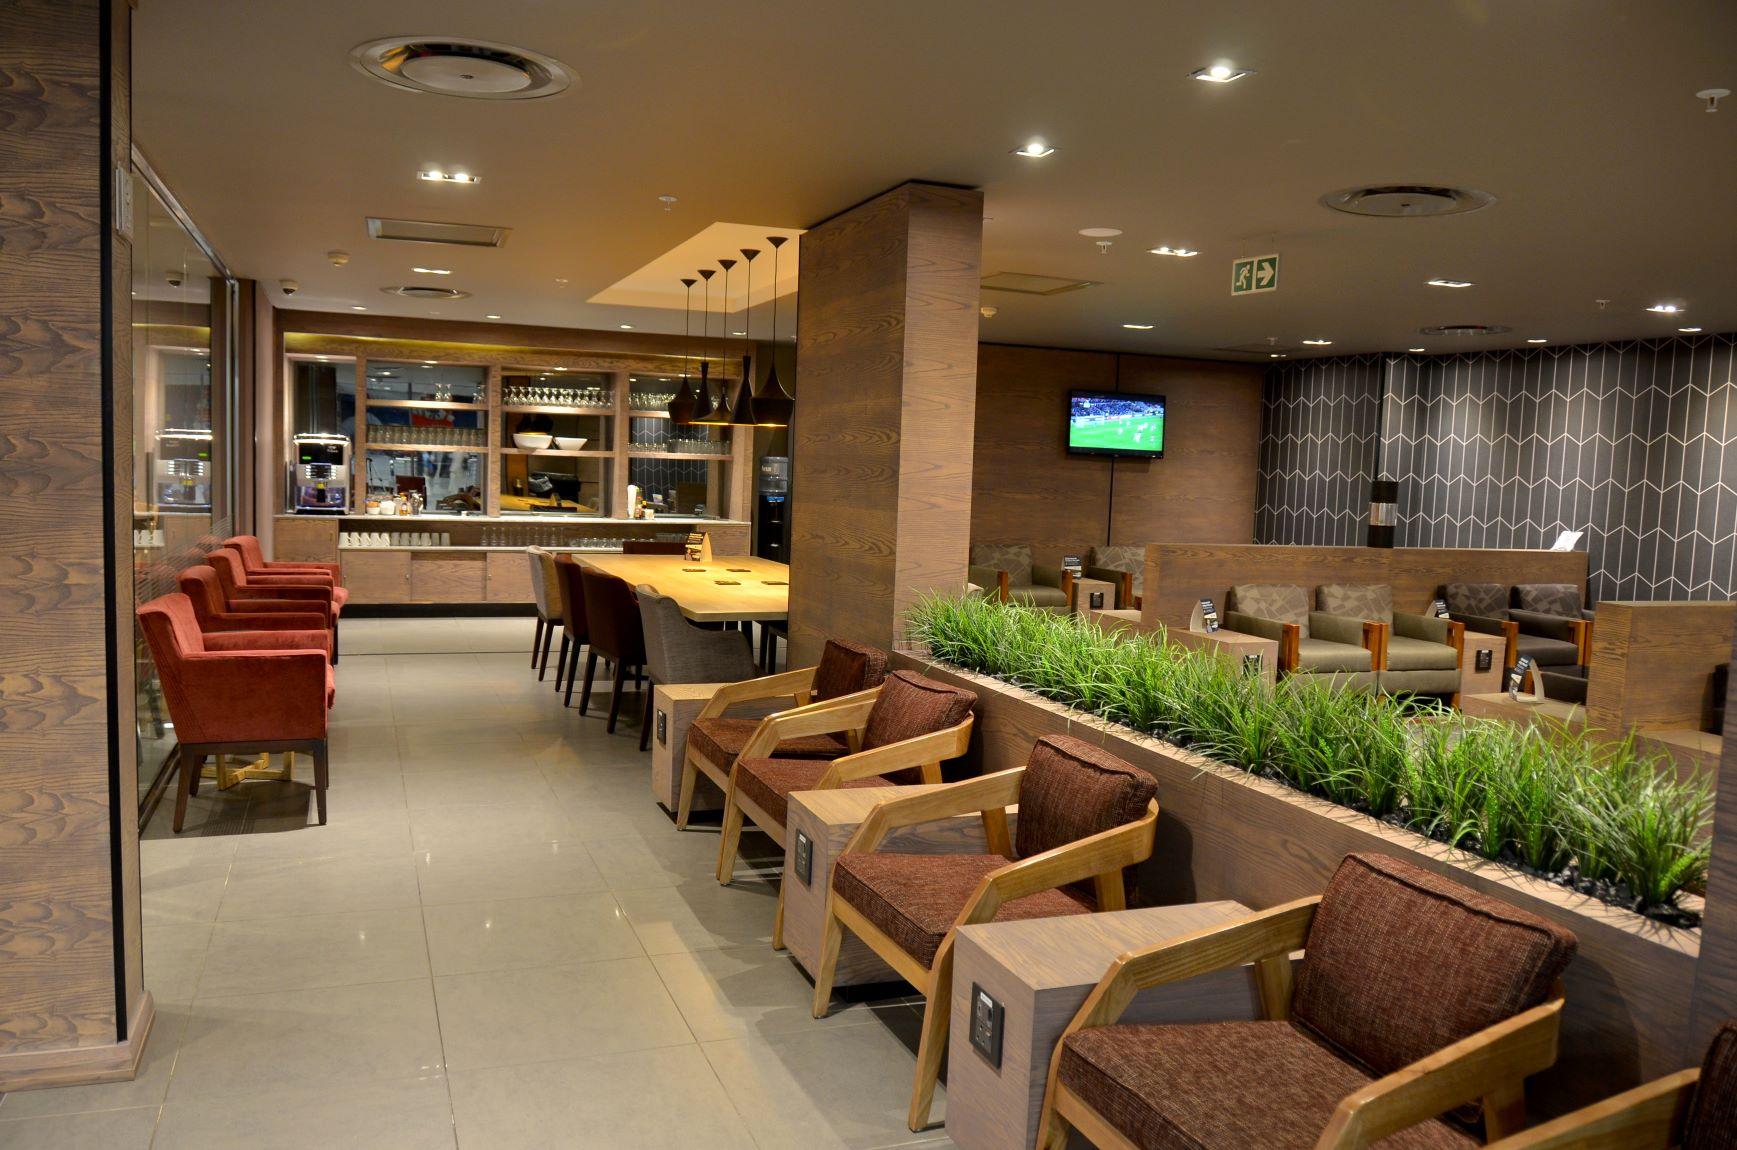 Bidvest Premier Lounge and Michelangelo winning wines and spirits unite to pamper travellers' taste buds photo